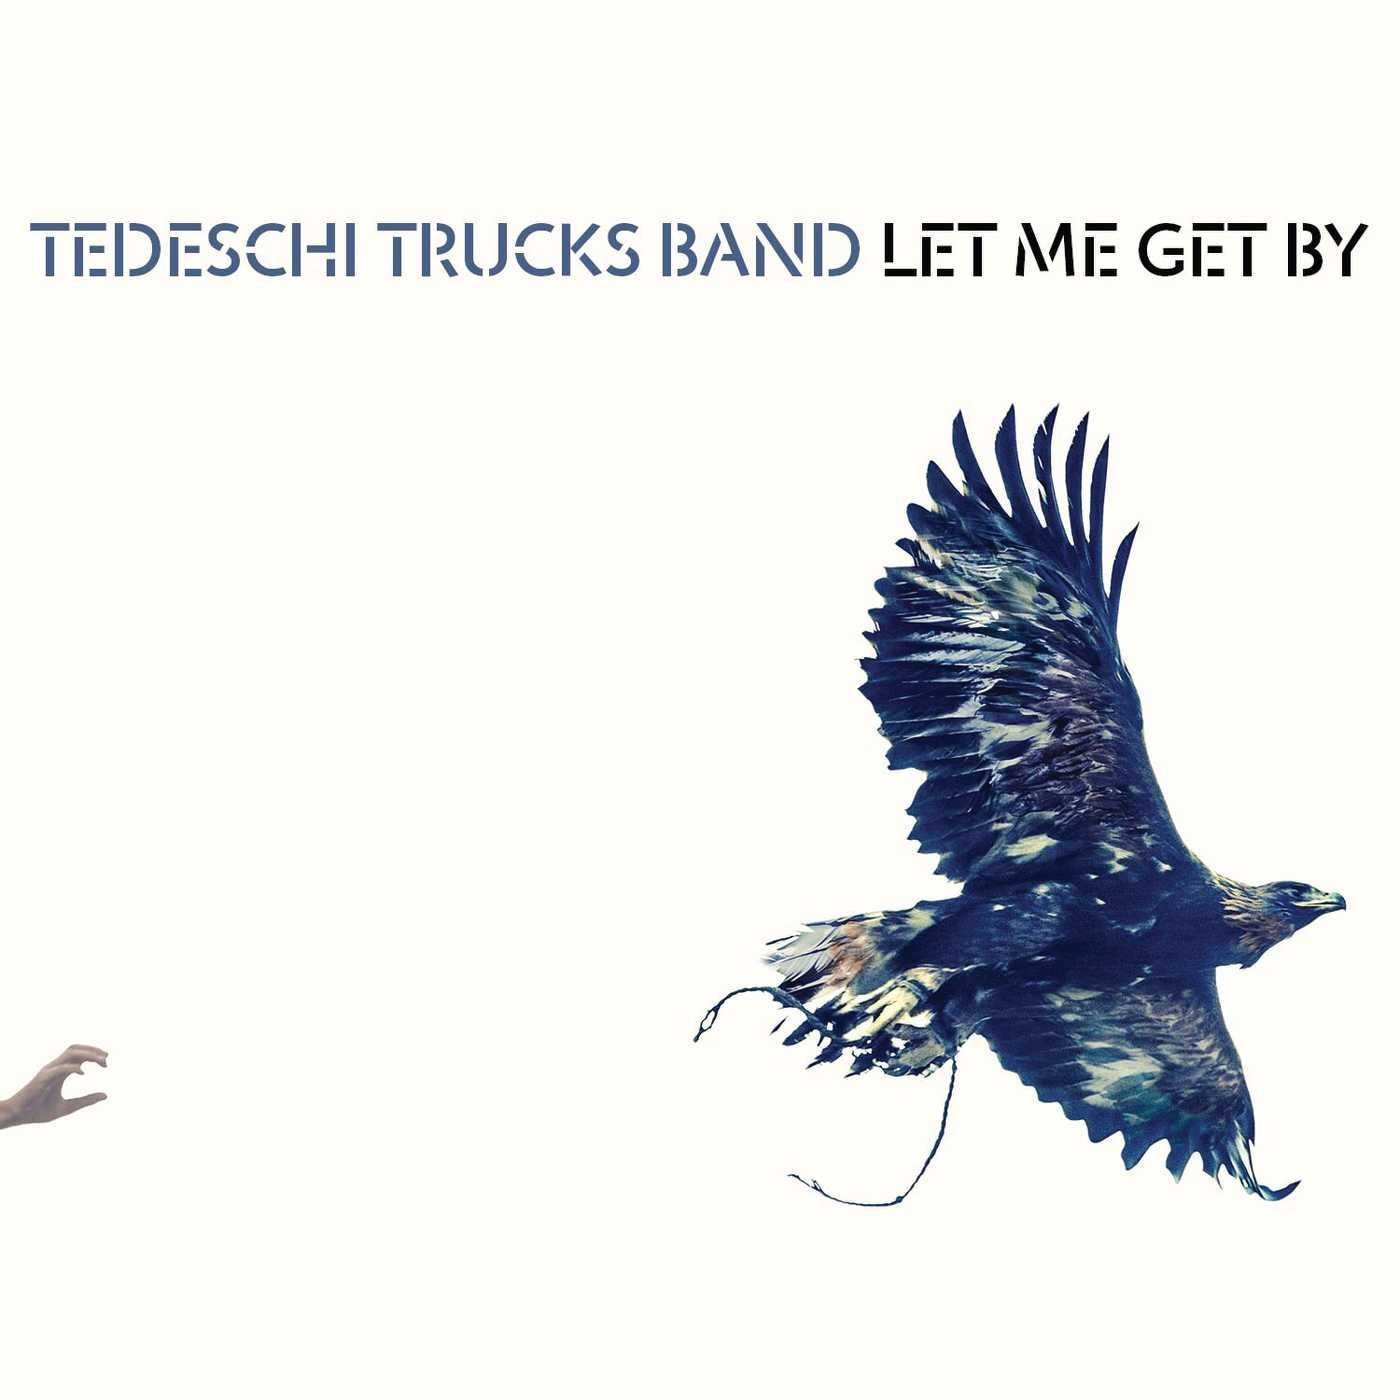 ttb-let-me-get-by